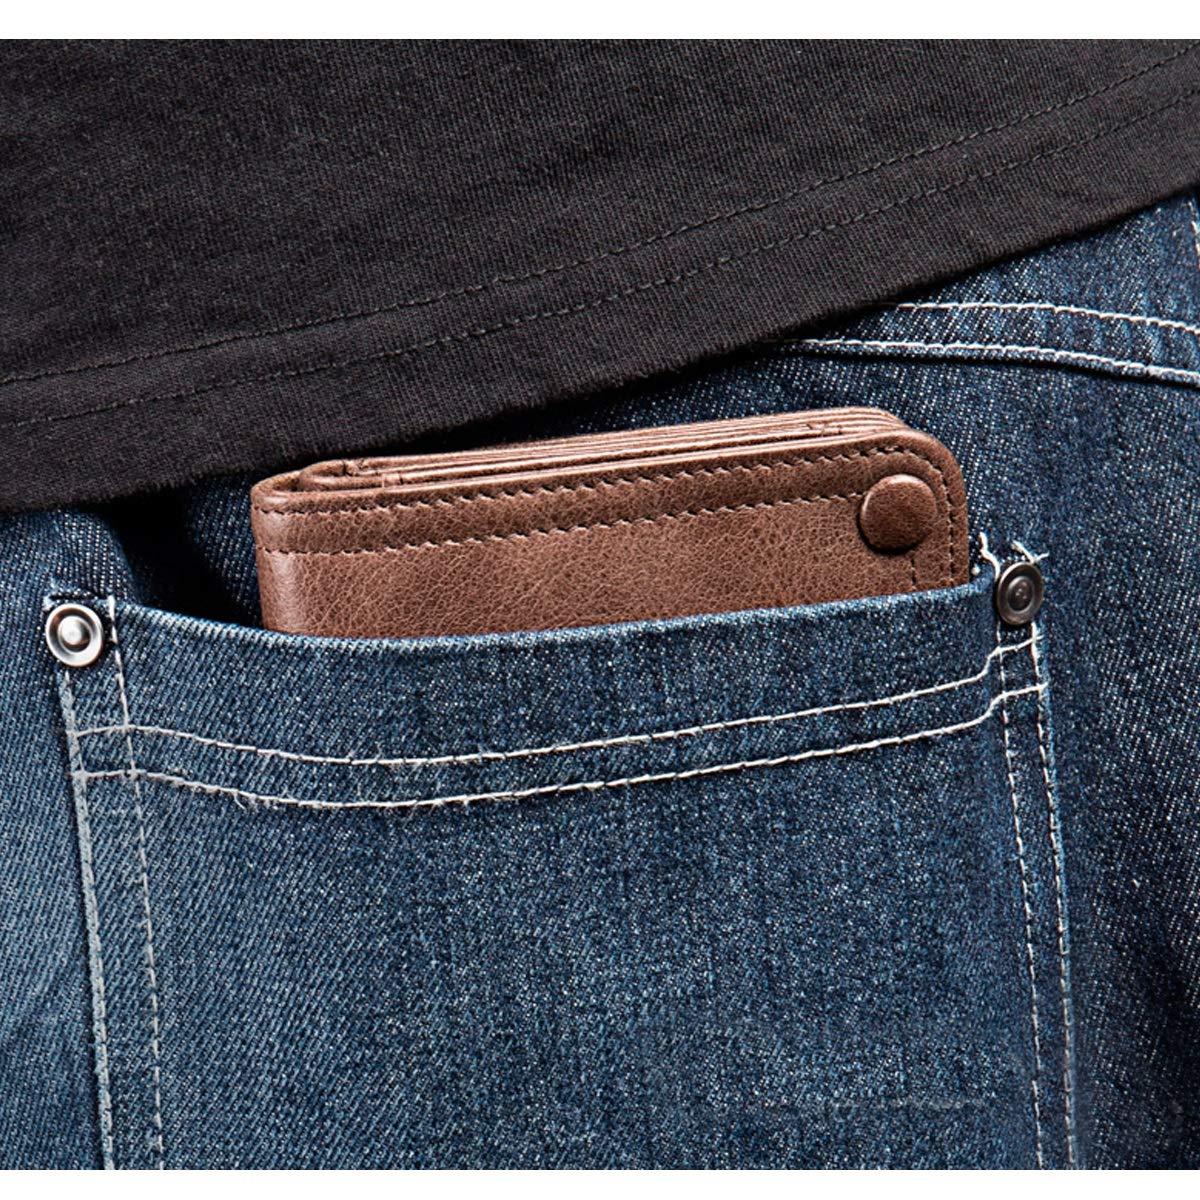 Large Travel Wallet Wrist Bag Extra Capacity Travel Wallet Kalmar RFID Travel Wallet Mens Leather Zip Wallet Clutch Color : Brown